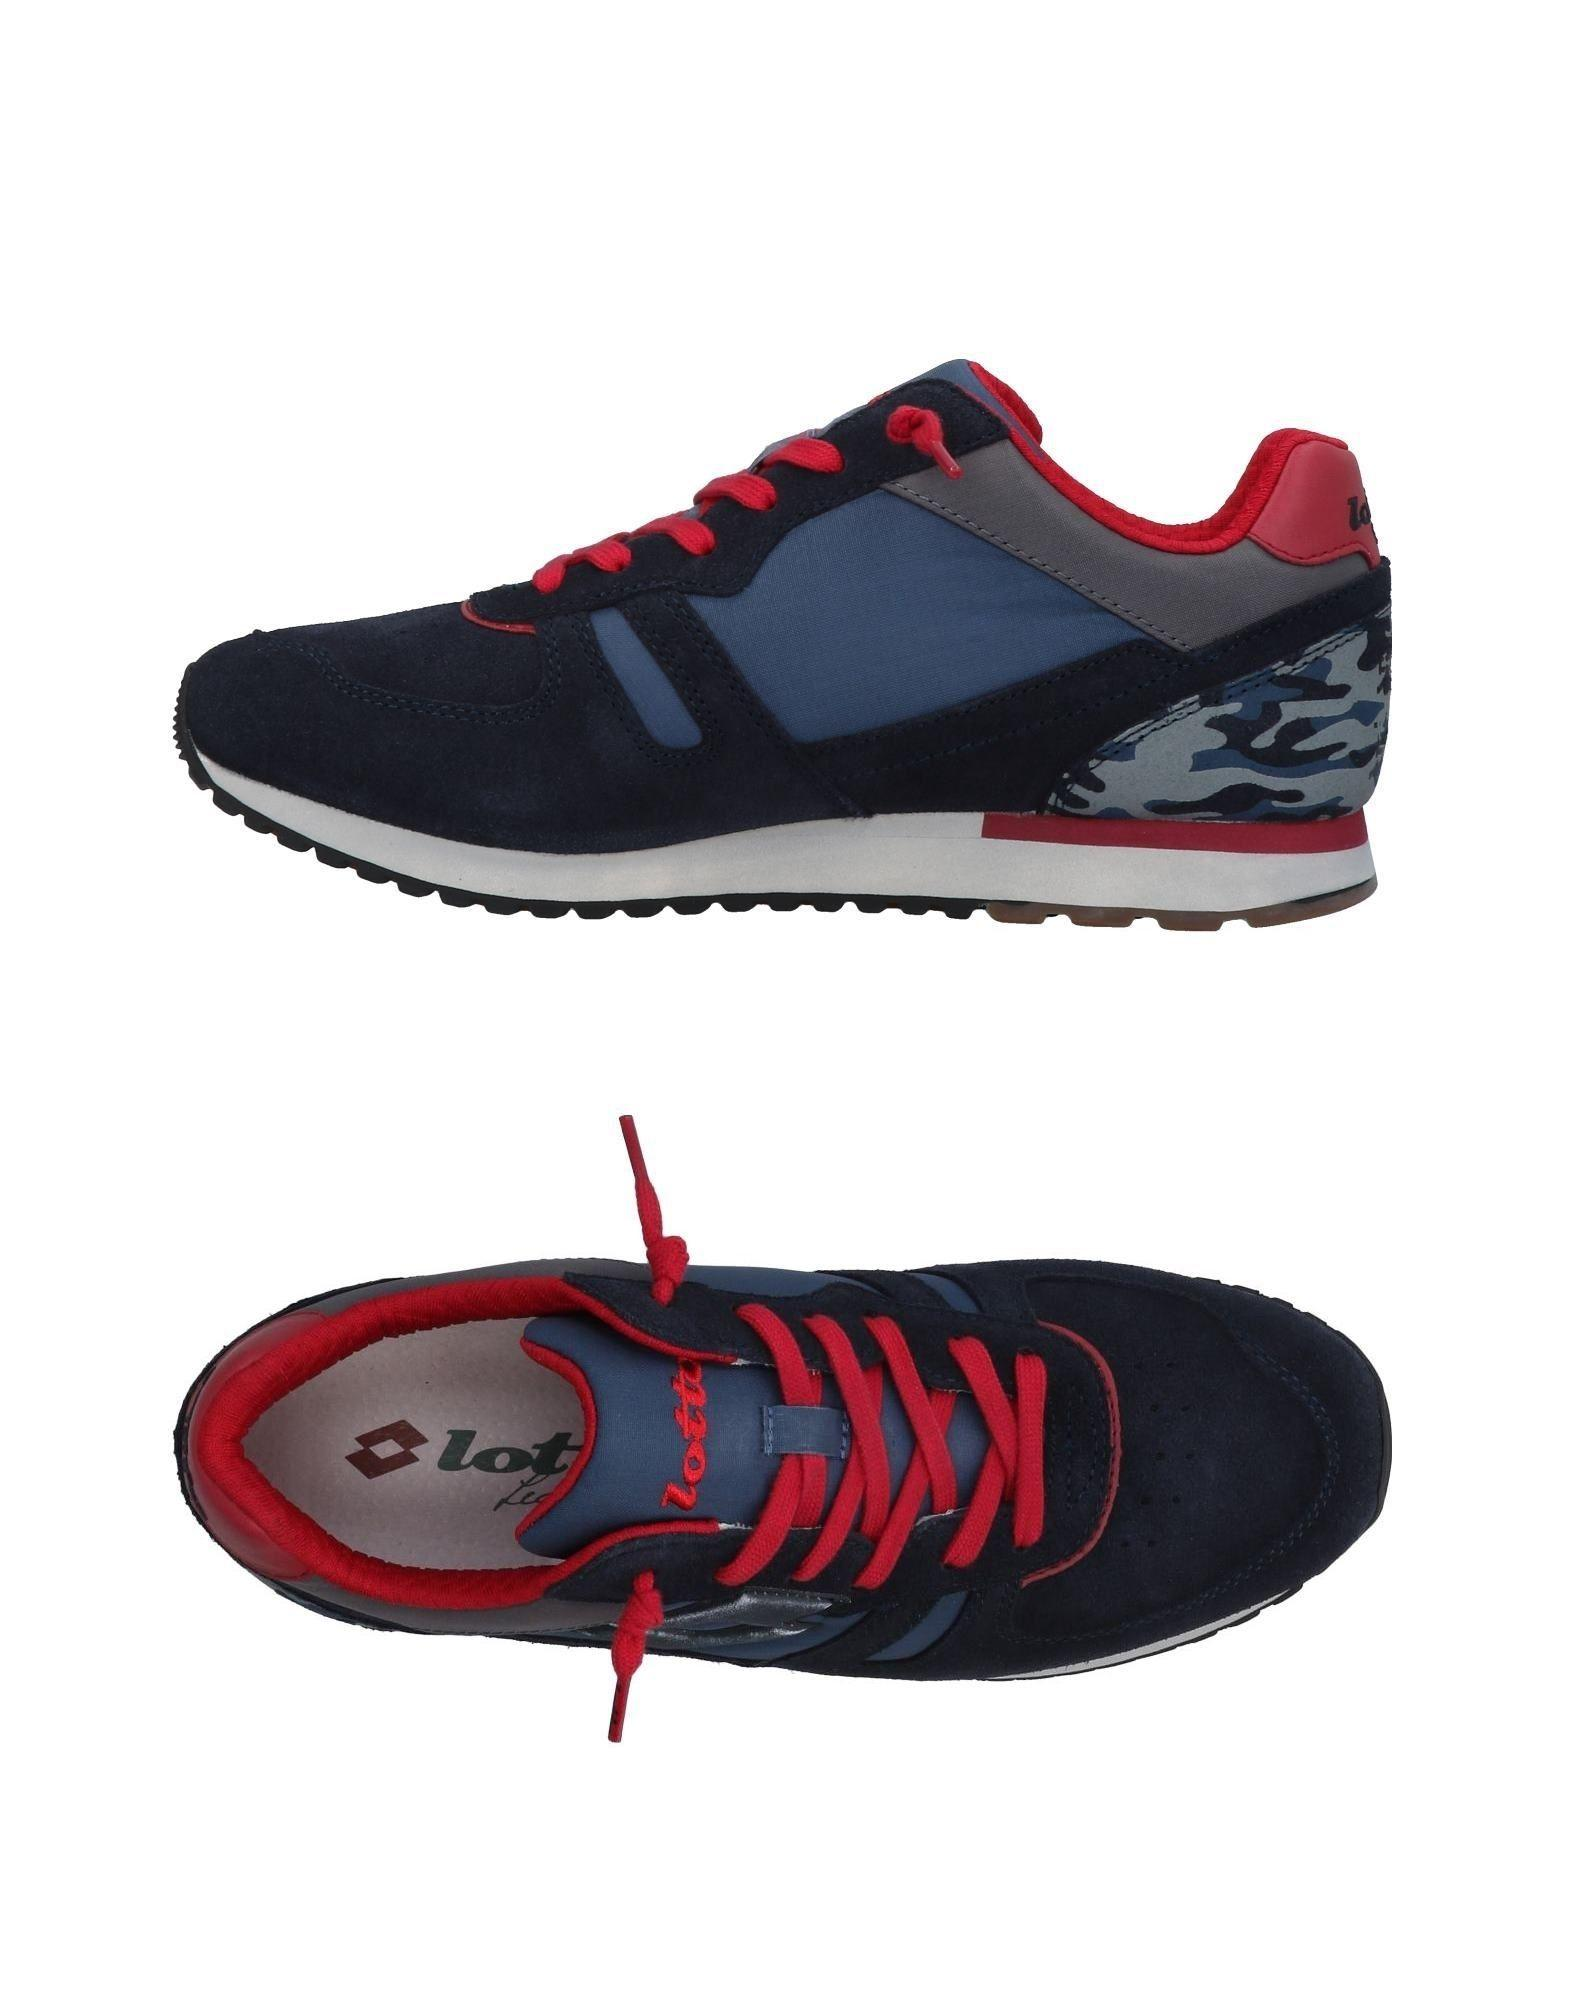 Lotto Leggenda Sneakers In Dark Blue